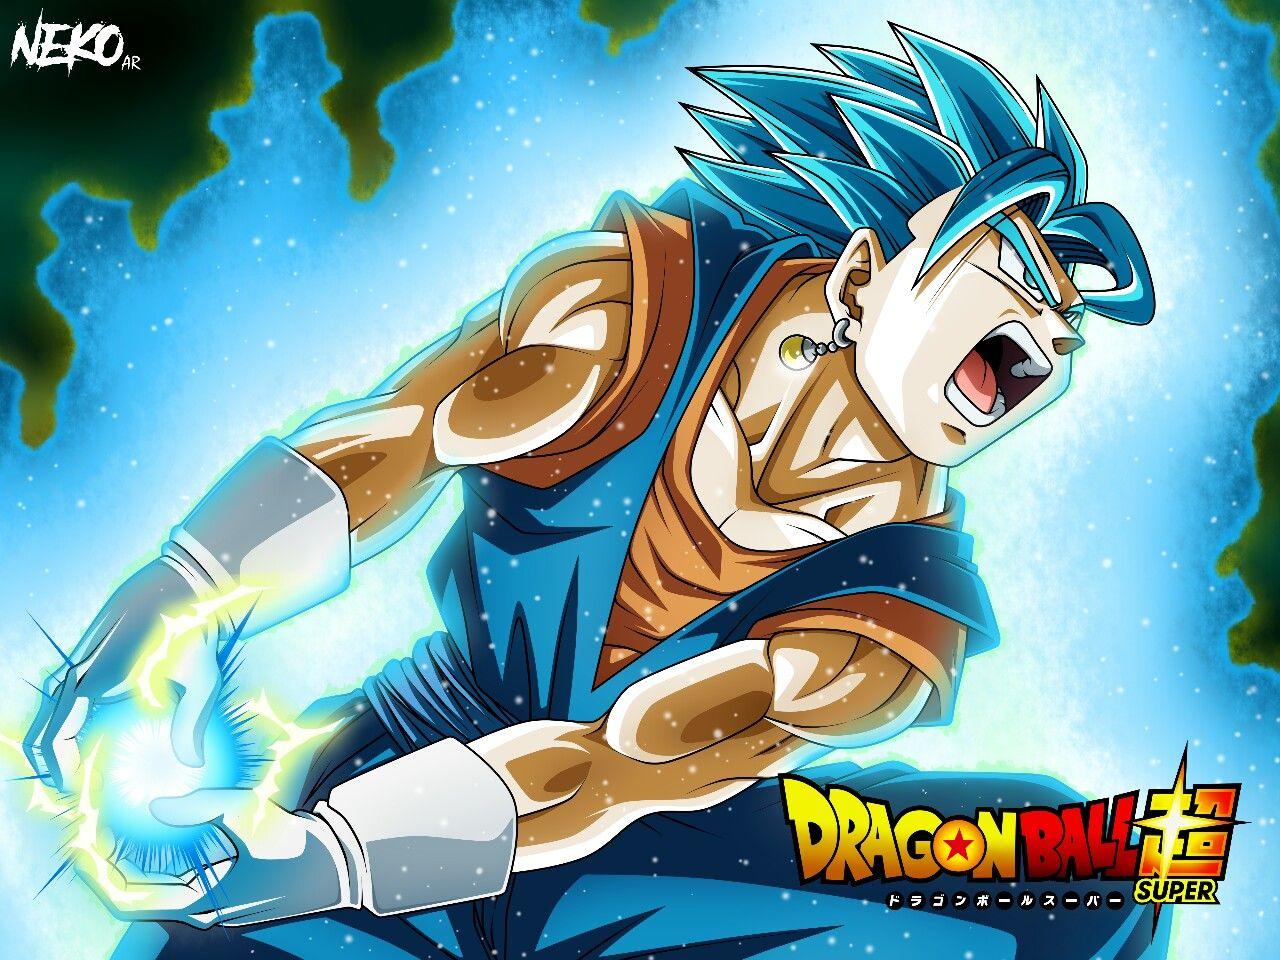 Vegetto Final Kamehameha Dragon Ball Super Manga Dragon Ball Super Goku Anime Dragon Ball Super